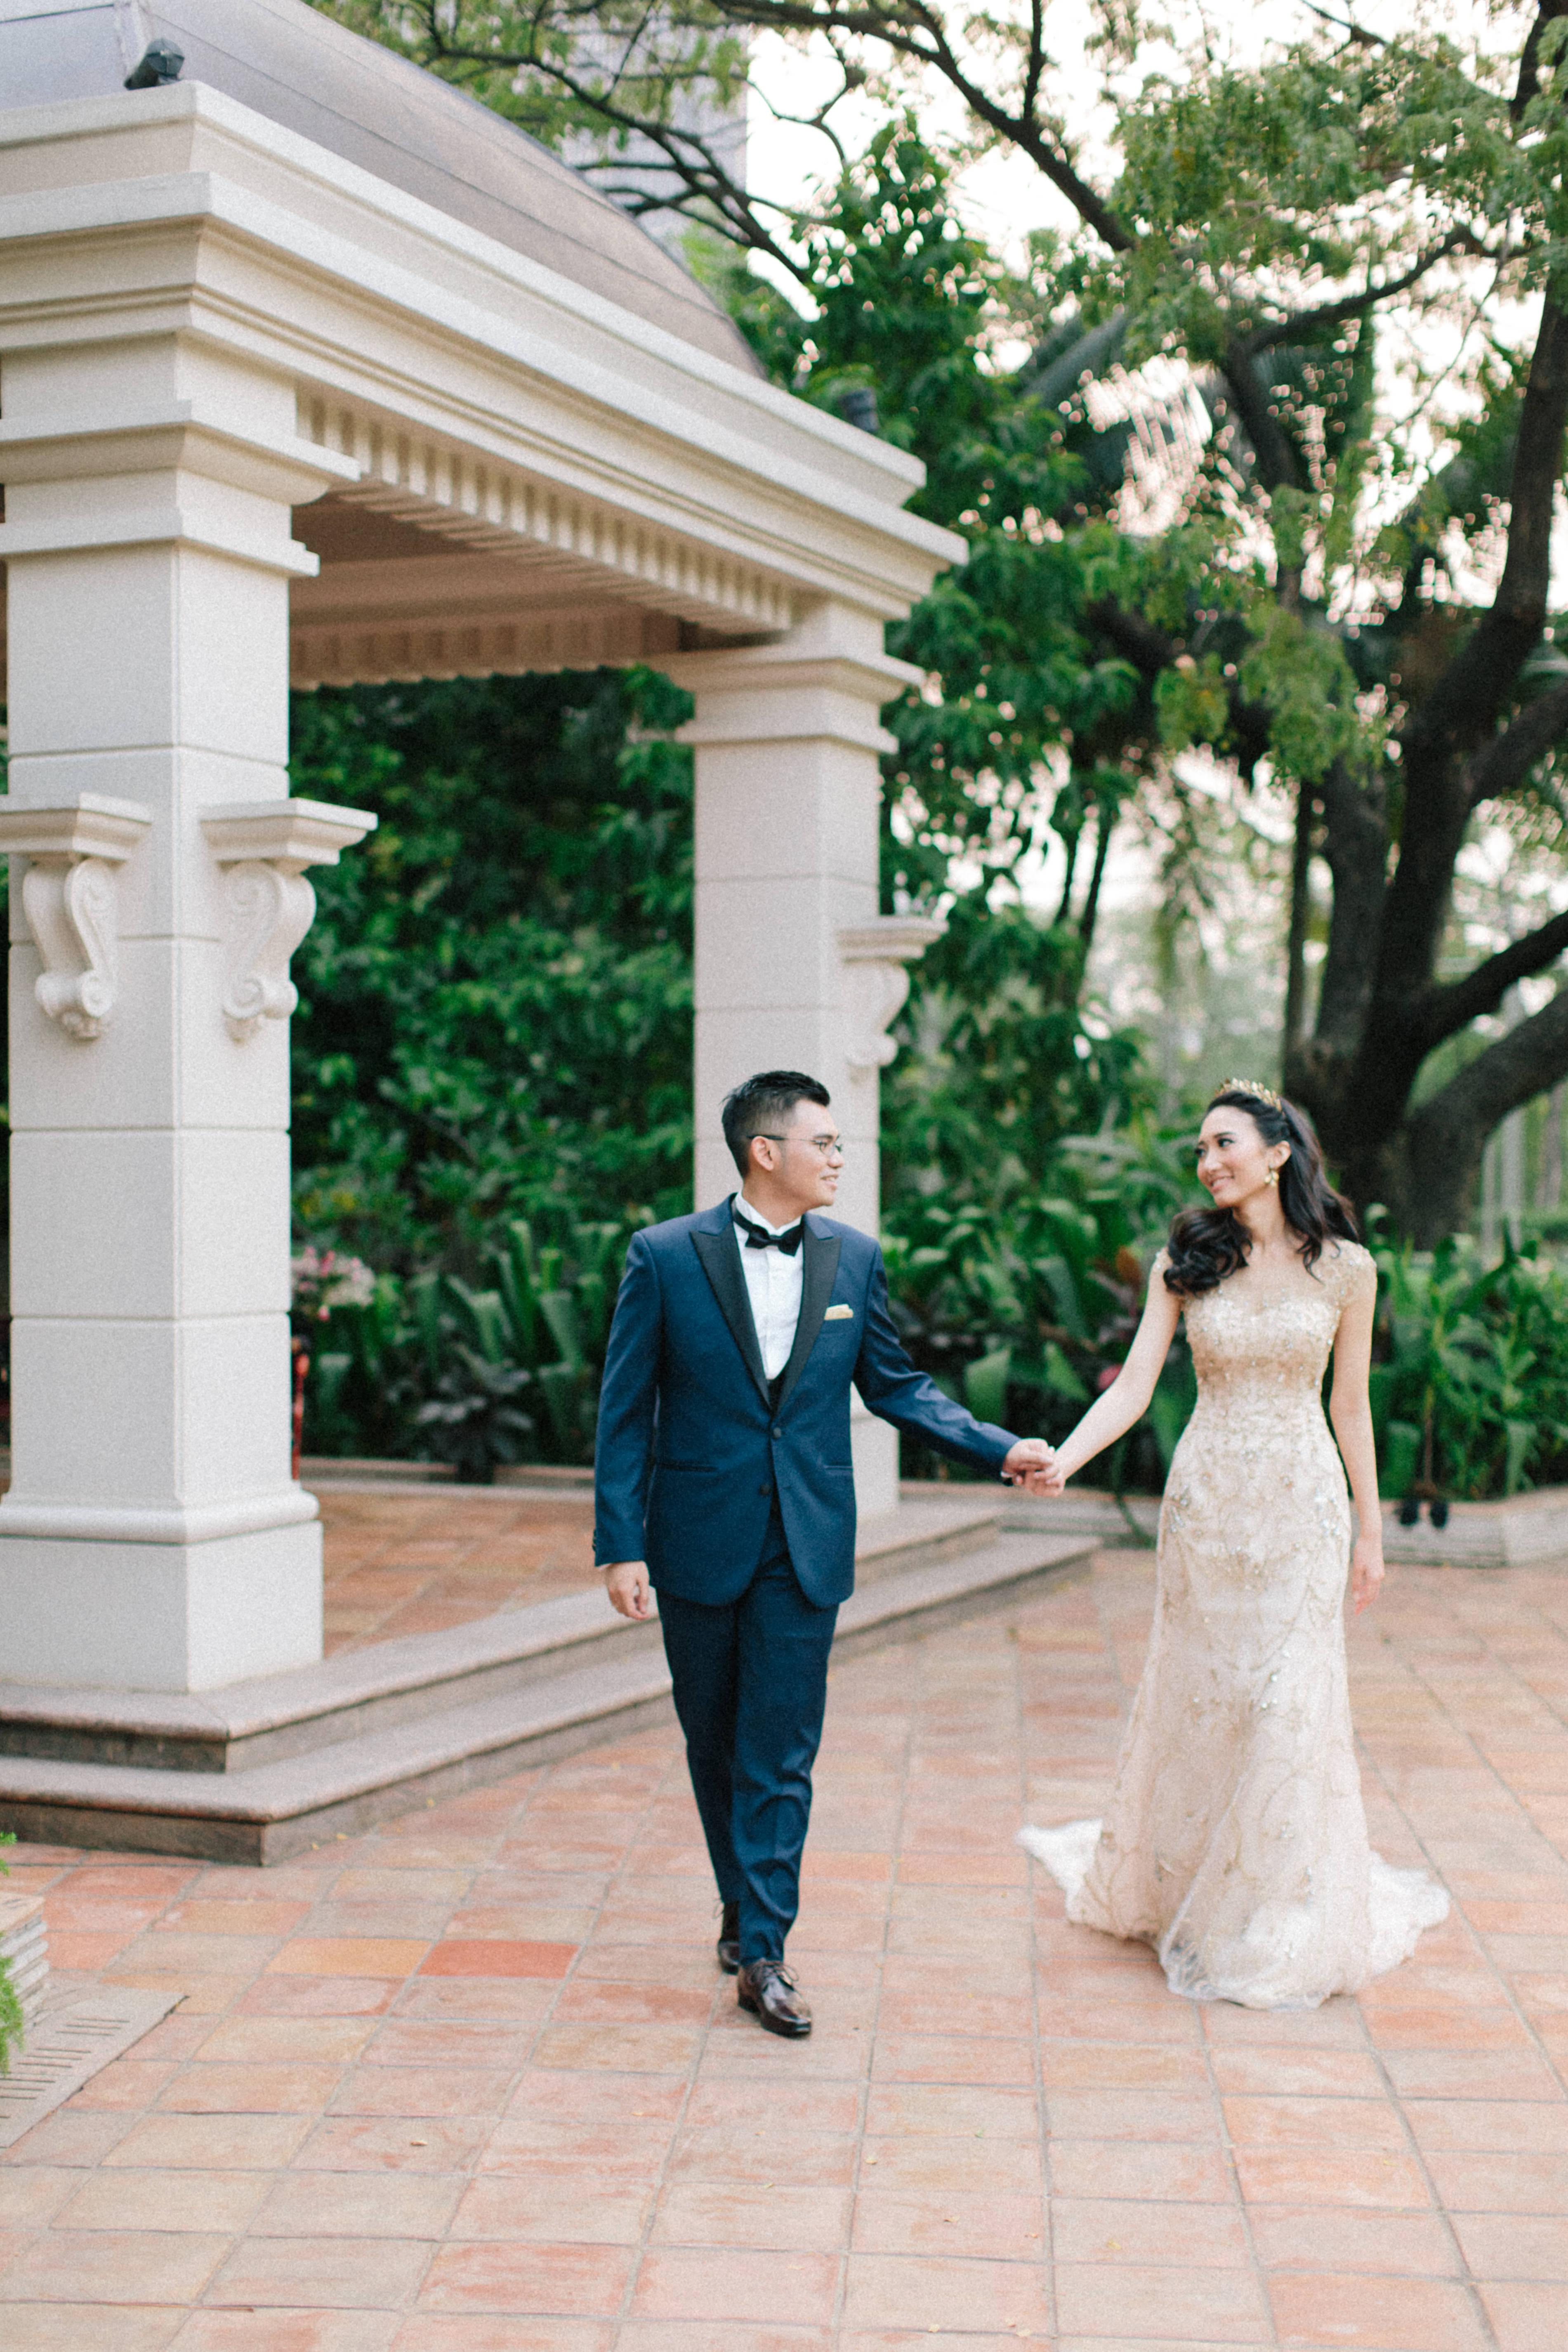 wedding reception bride groom formal wear walk together